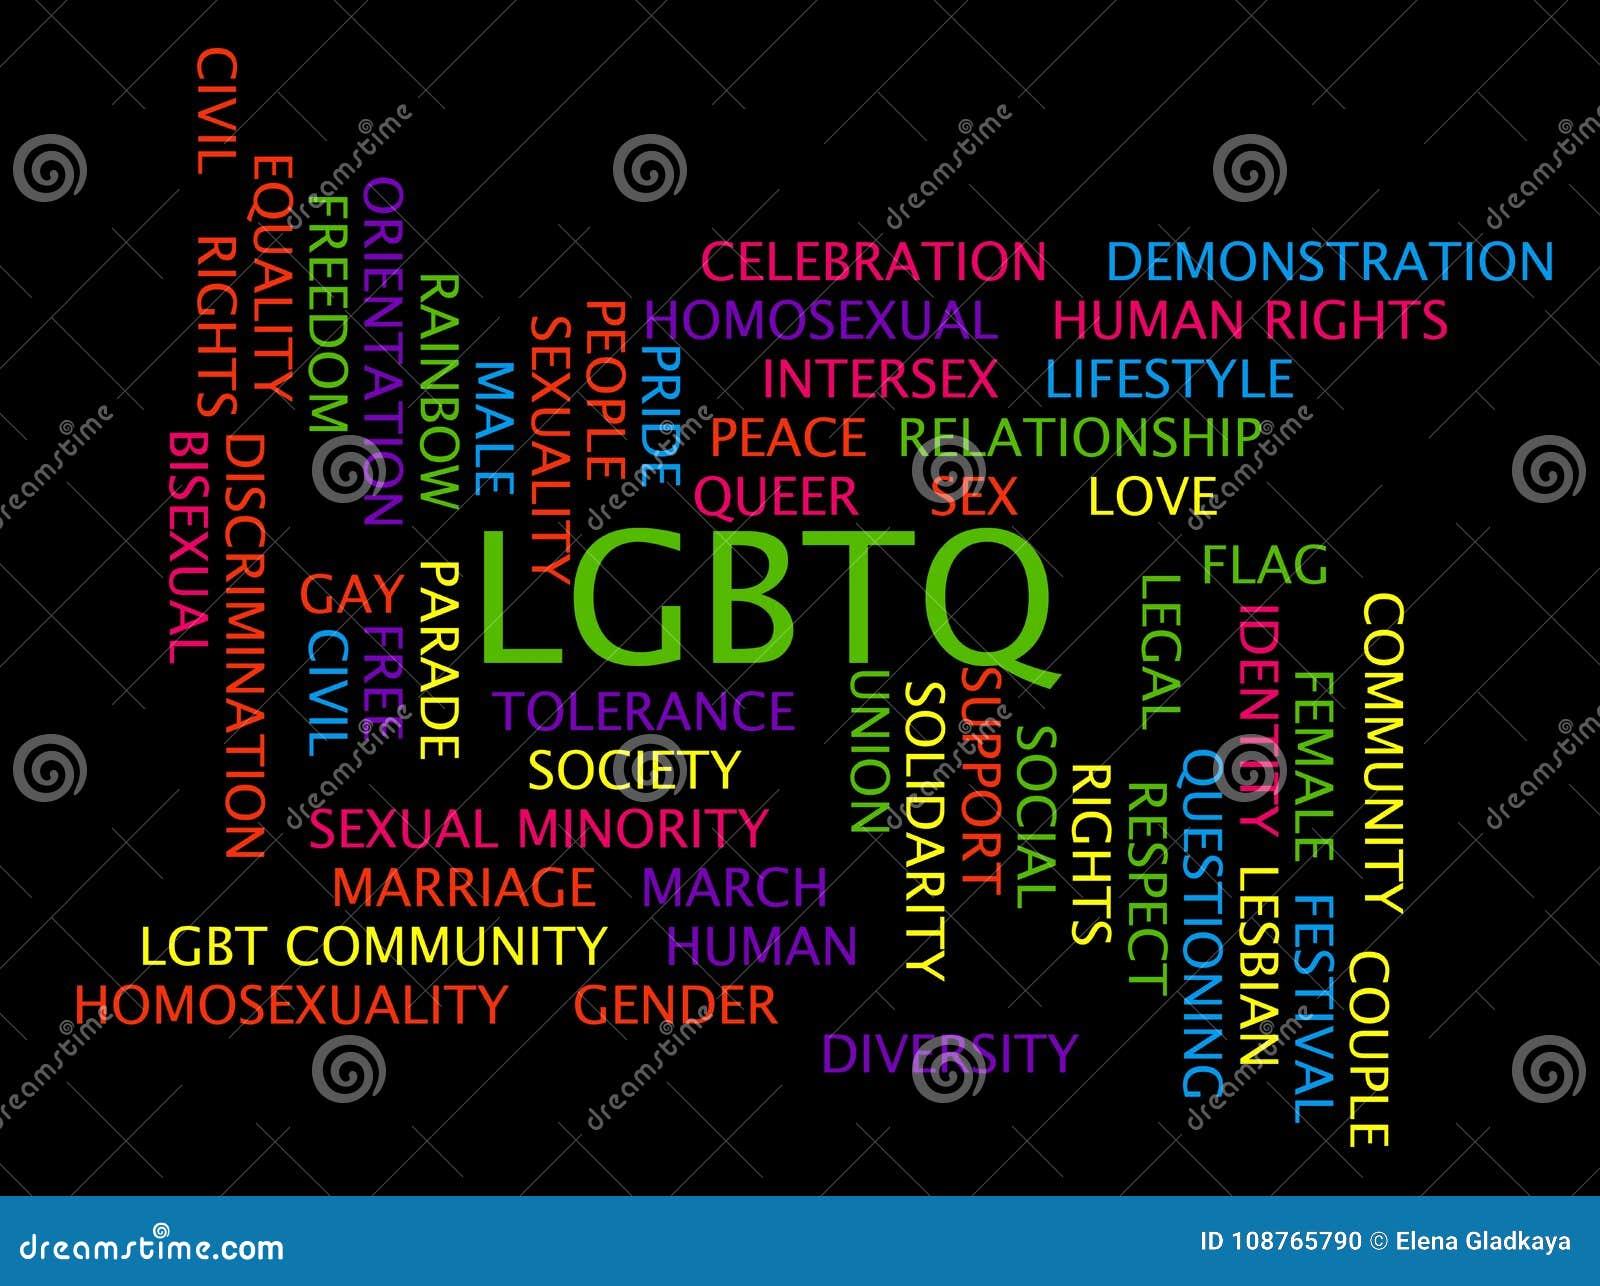 gratis nero Lesbia gay MRN porno